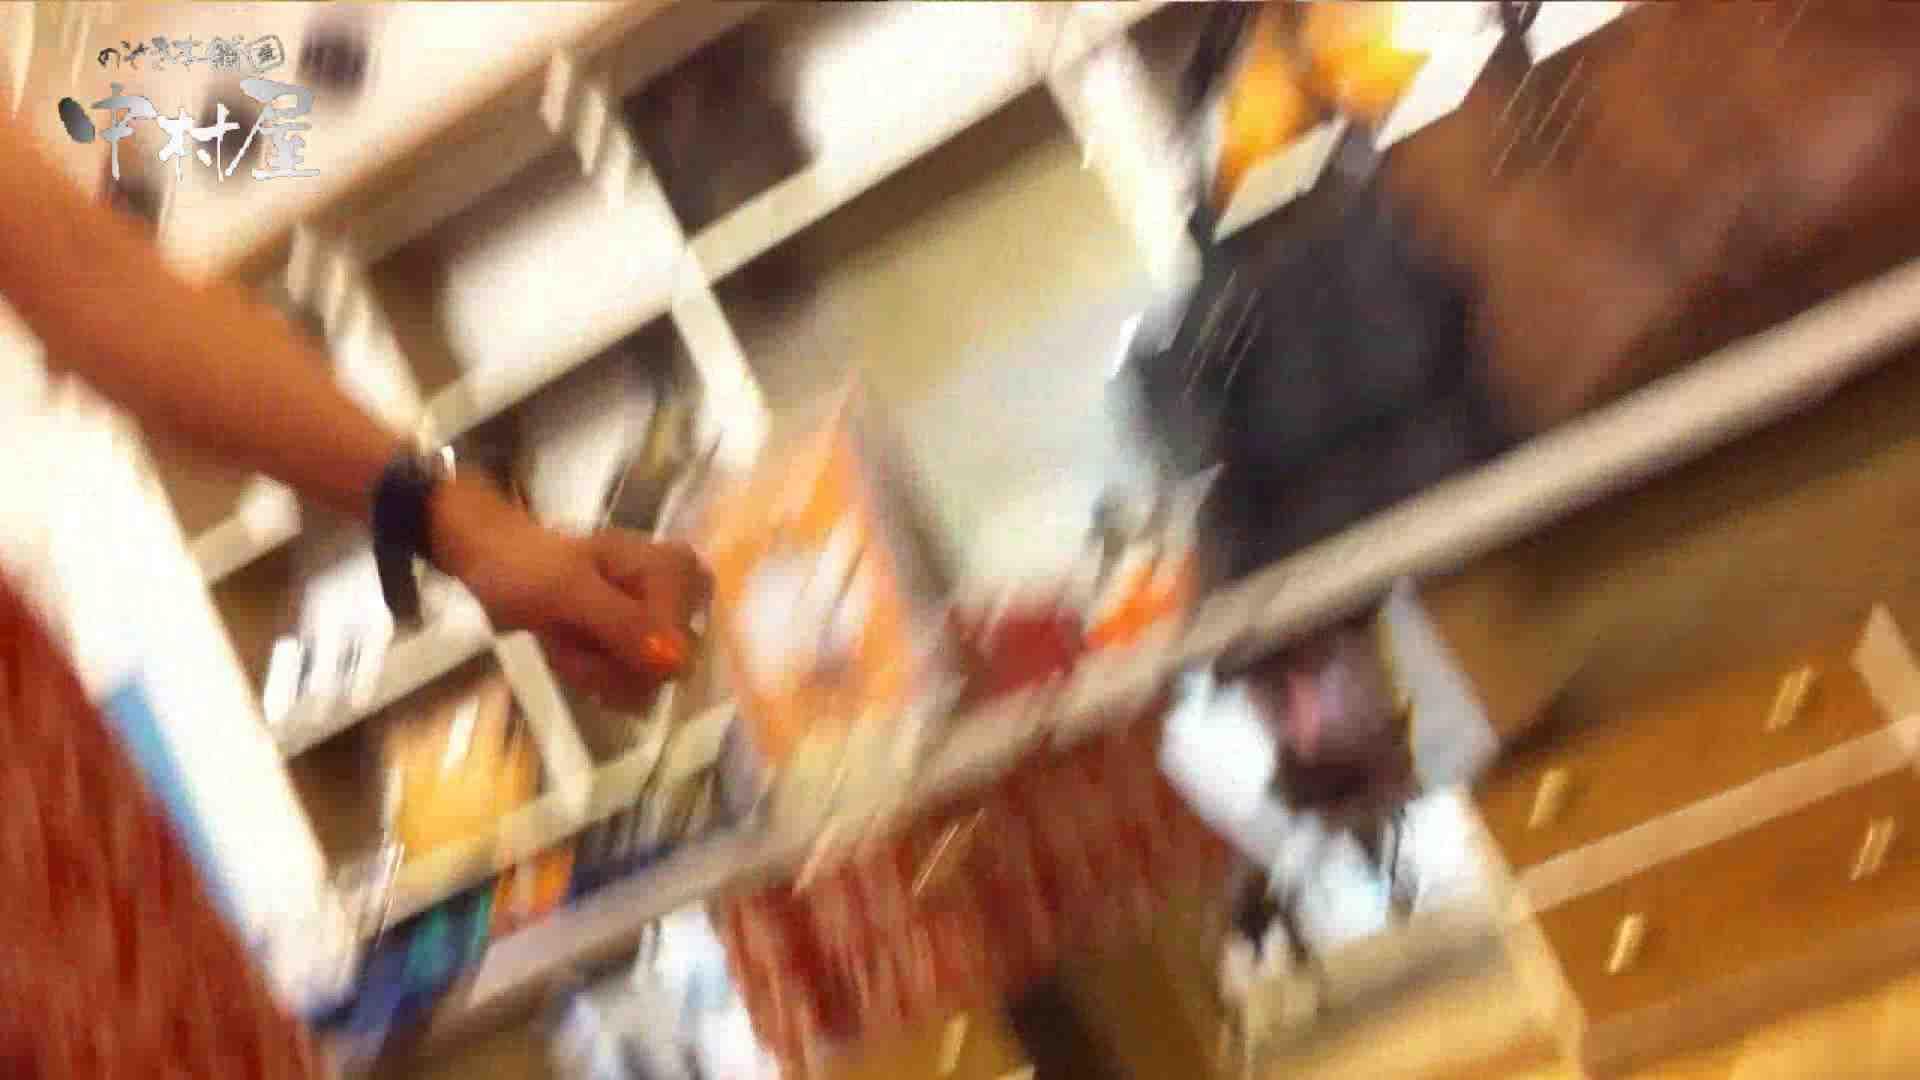 vol.43 可愛いカリスマ店員限定‼胸チラ&パンチラ 美脚おねーさんの胸元ゲット! エロティックなOL AV無料動画キャプチャ 86画像 2